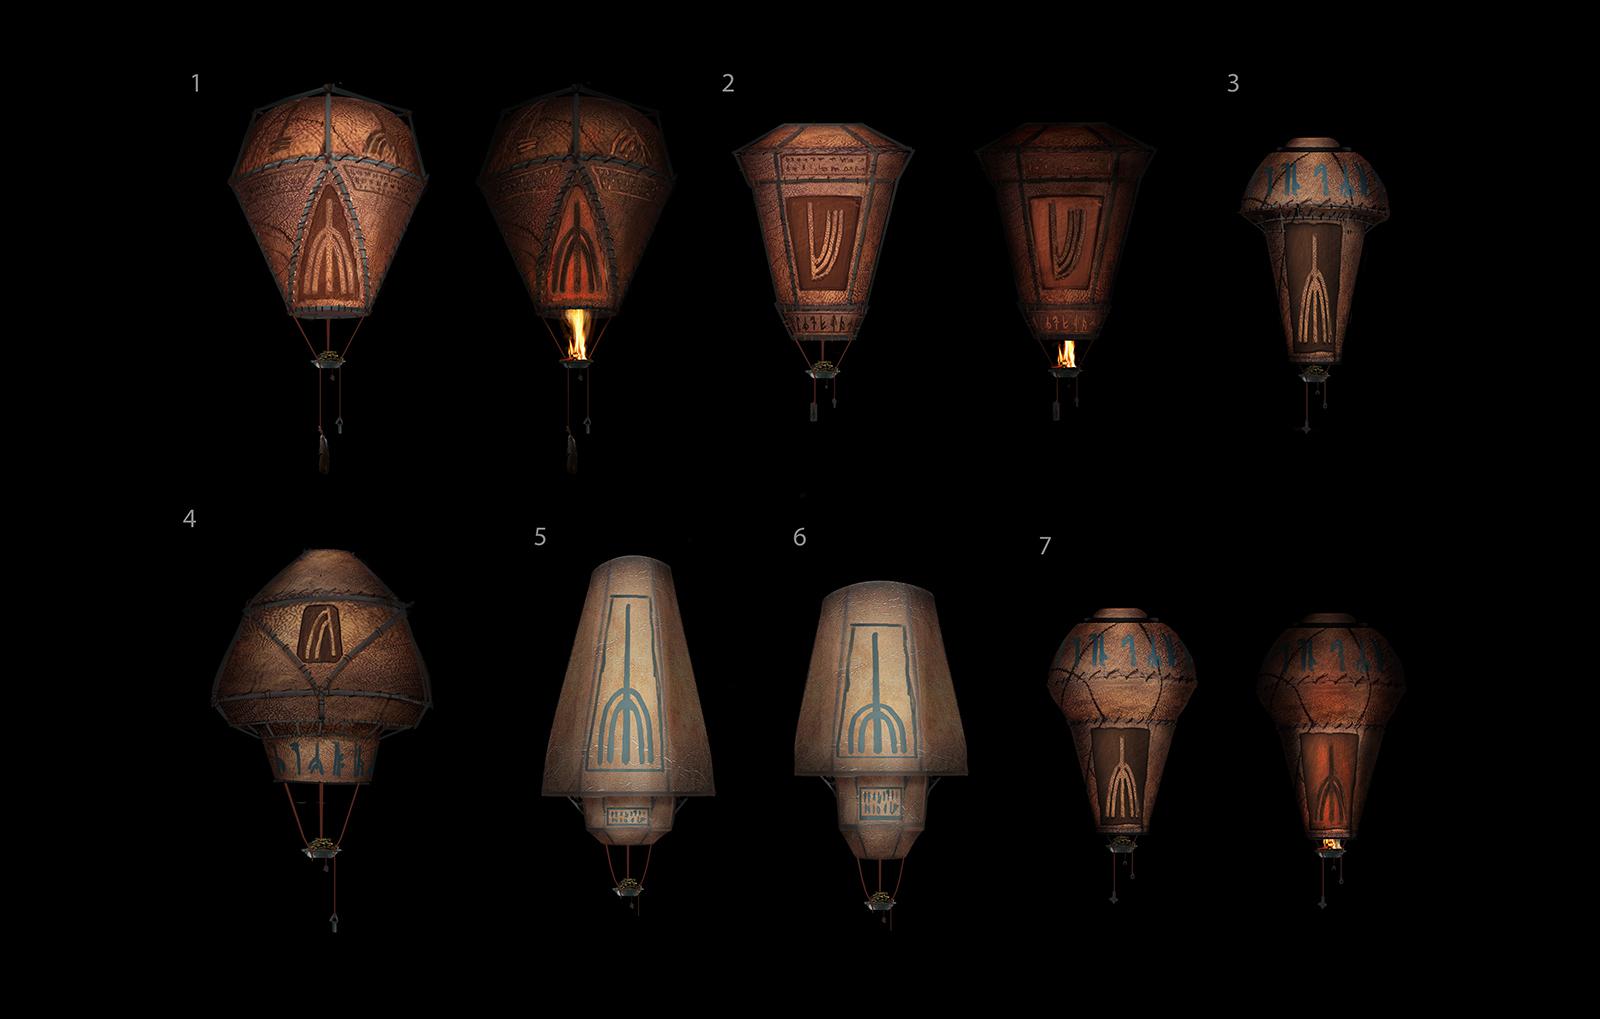 ancient balloons?